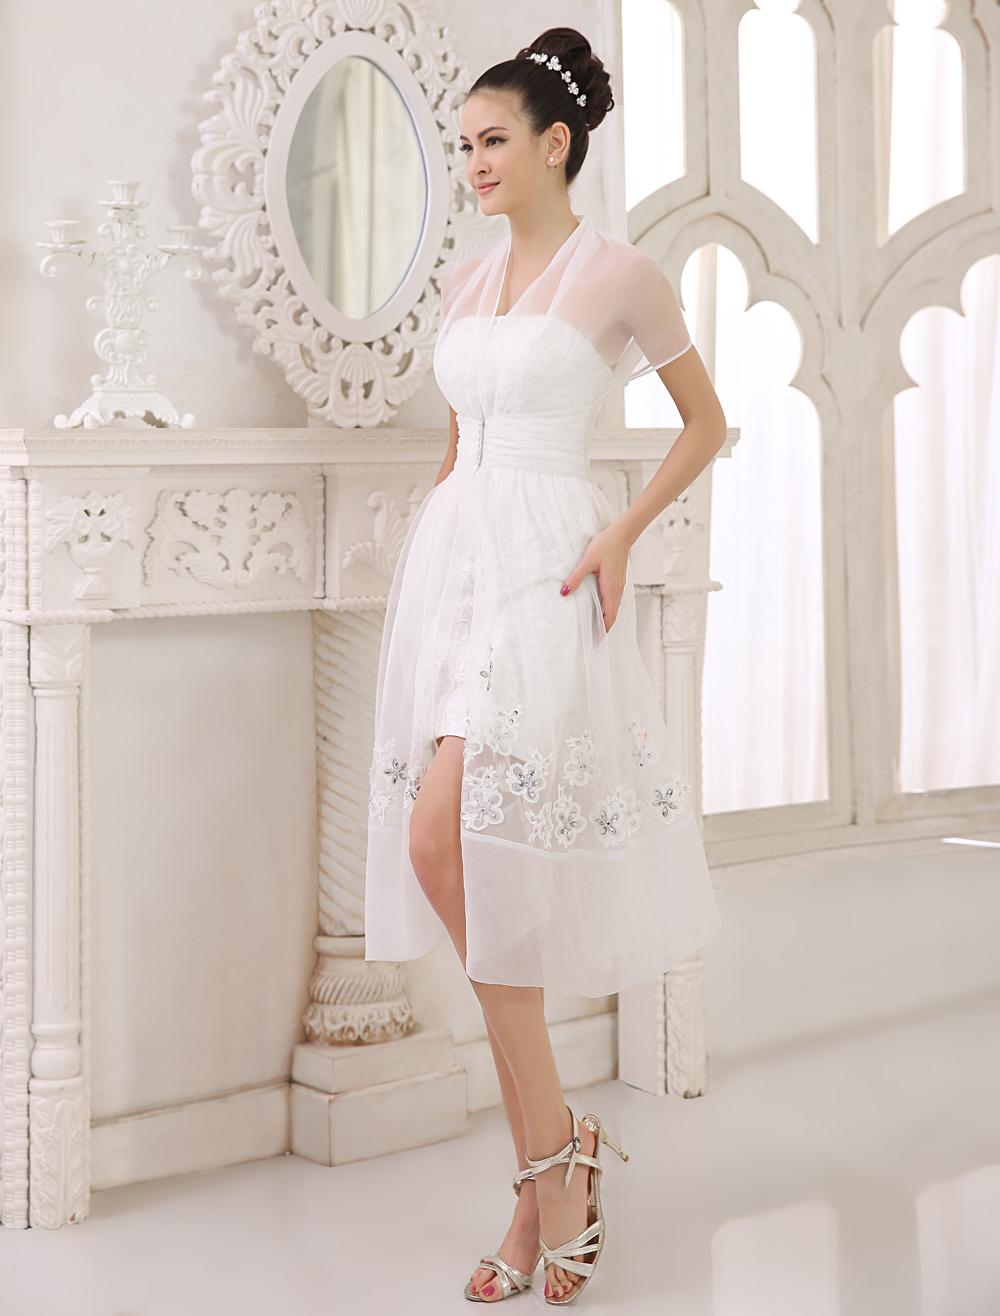 Short Ivory Bridal Wedding Dress with Strapless Neck and Sheath Applique Milanoo (Cheap Wedding Dress) photo